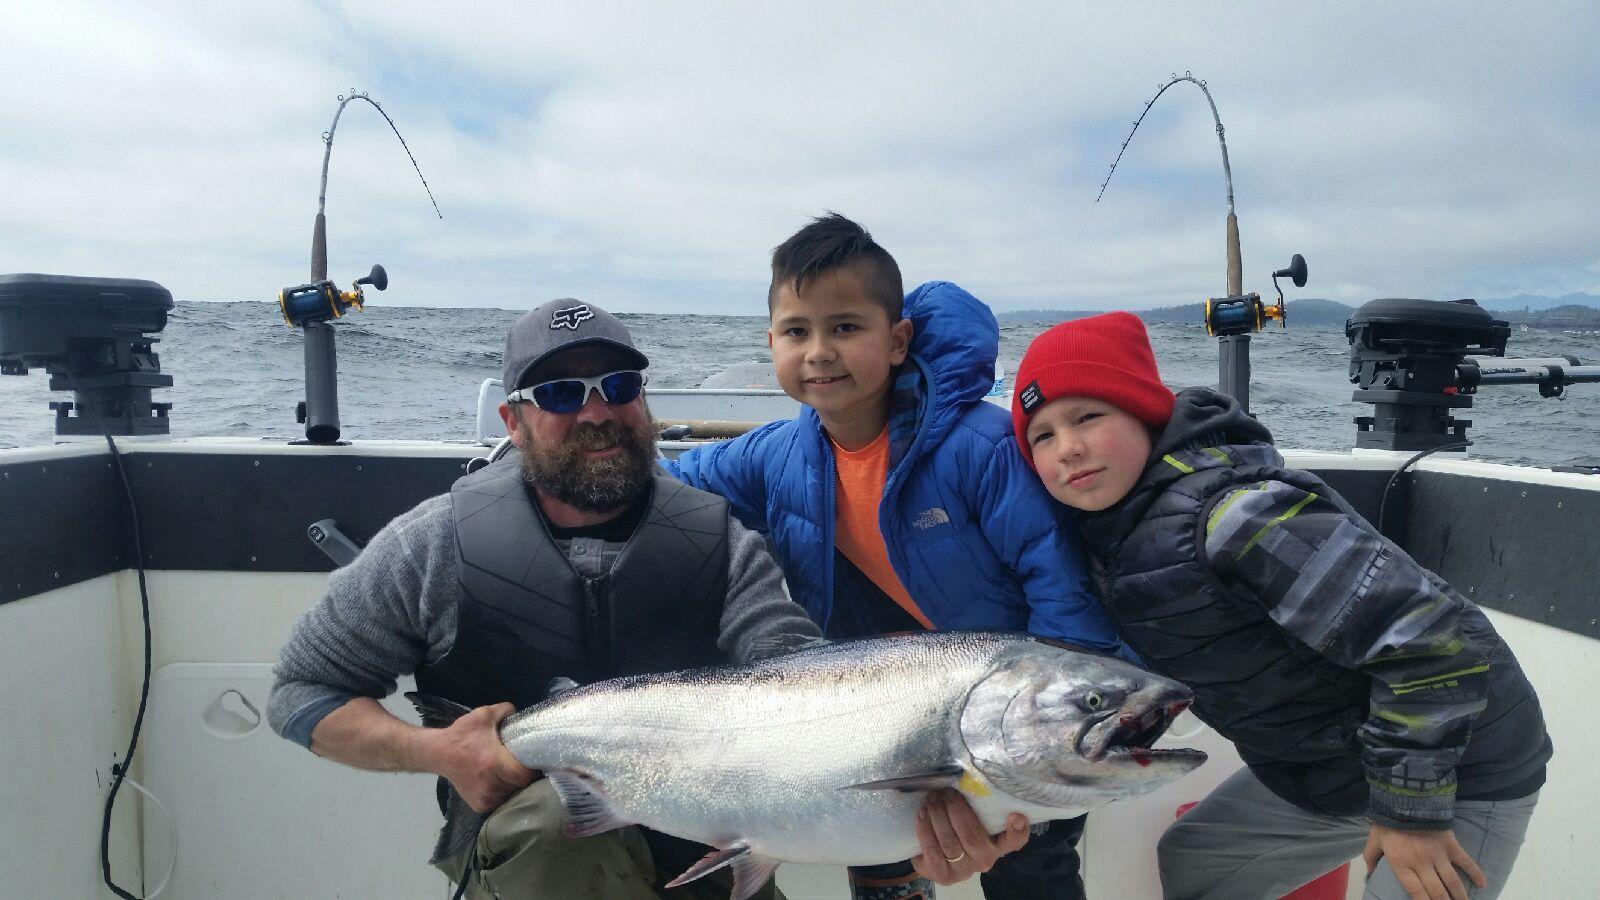 Man Holds Big Salmon